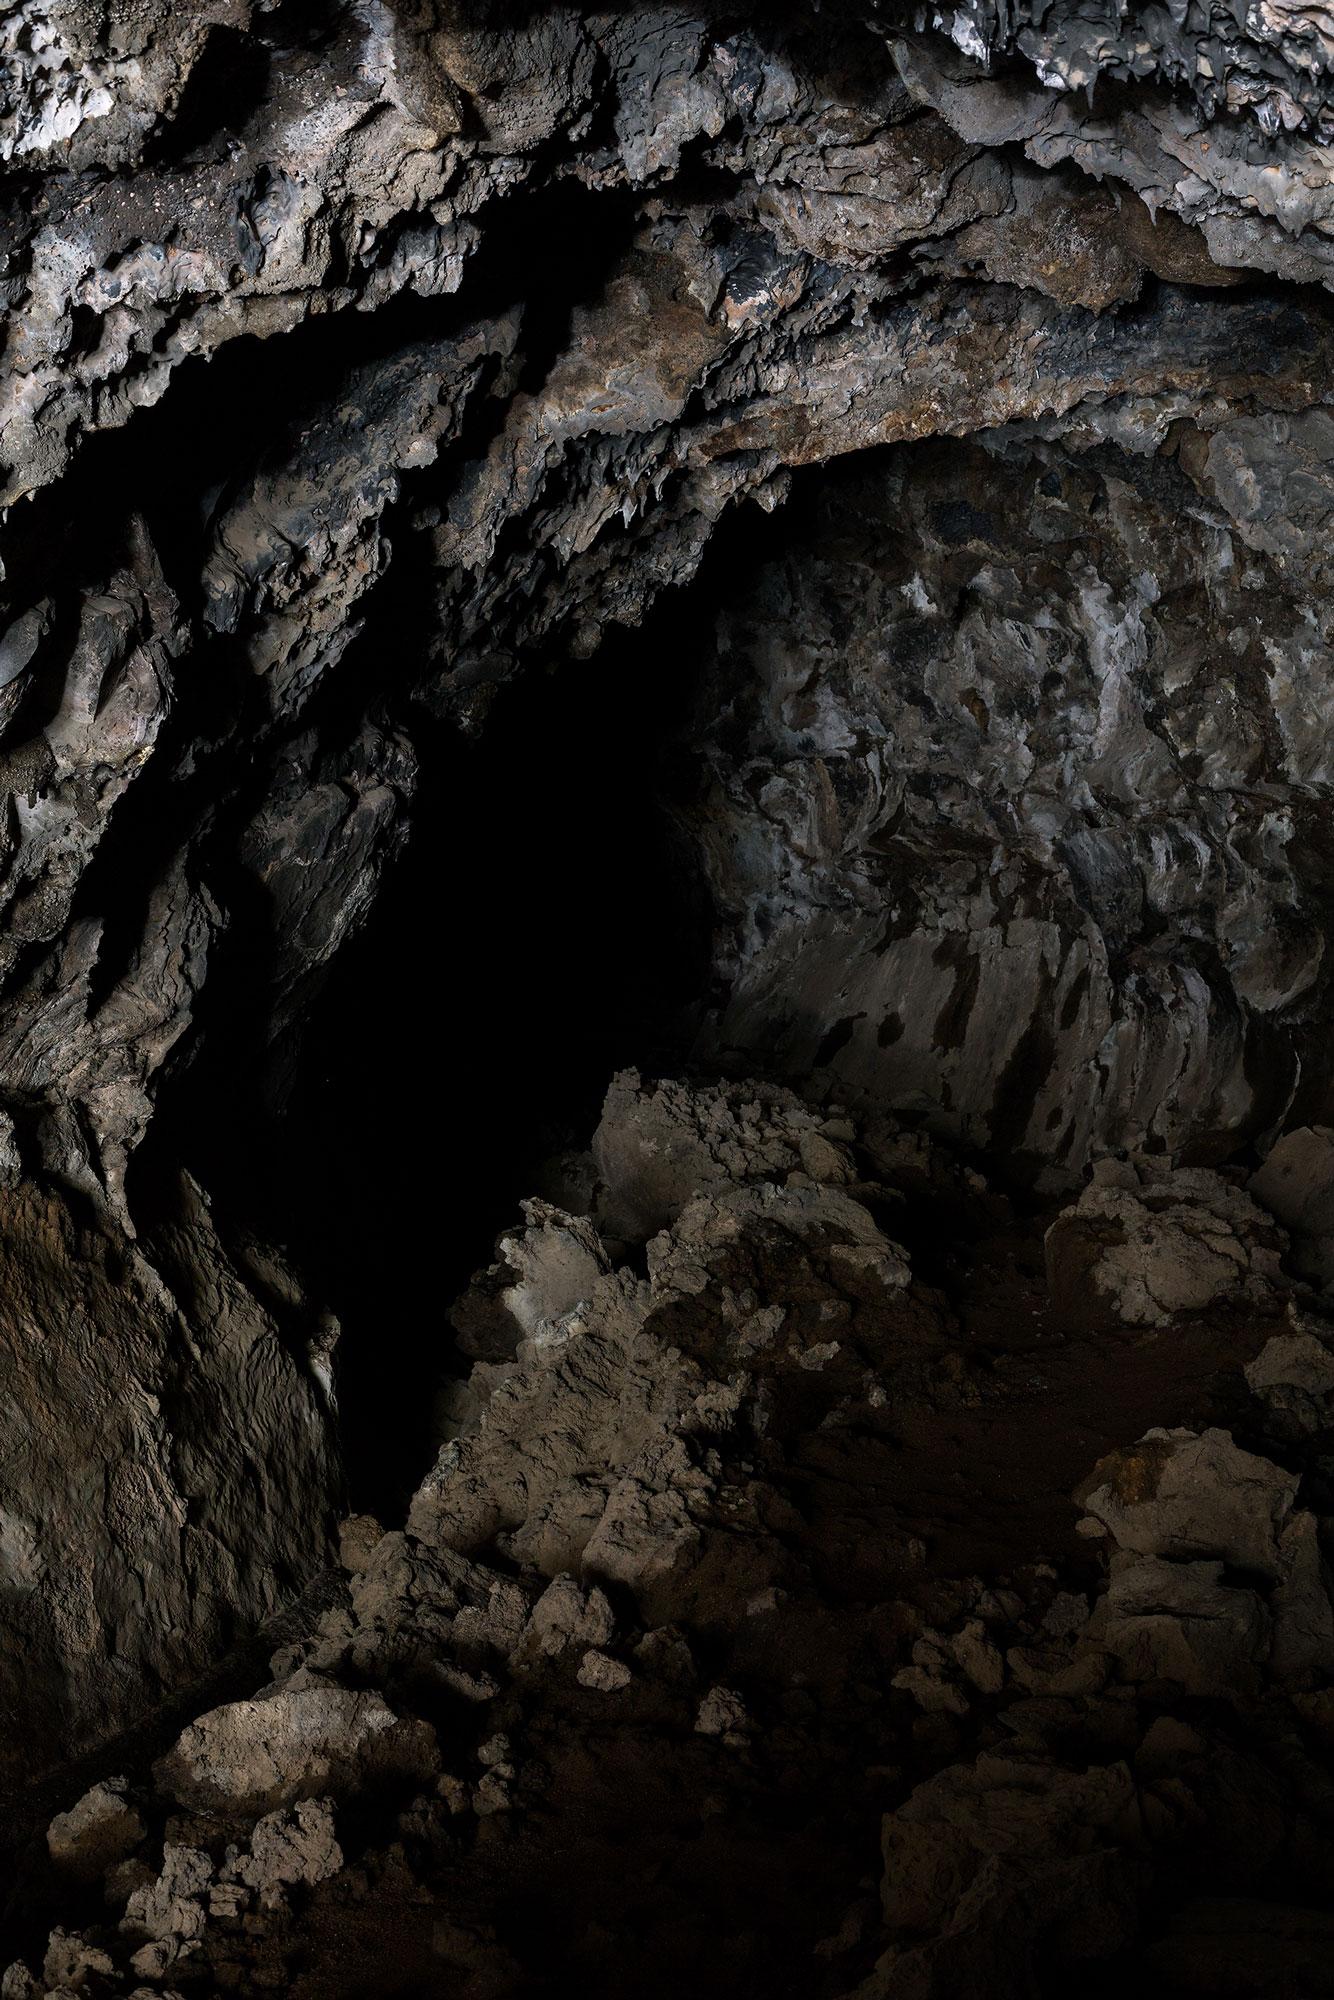 Modoc Caves 3.jpg